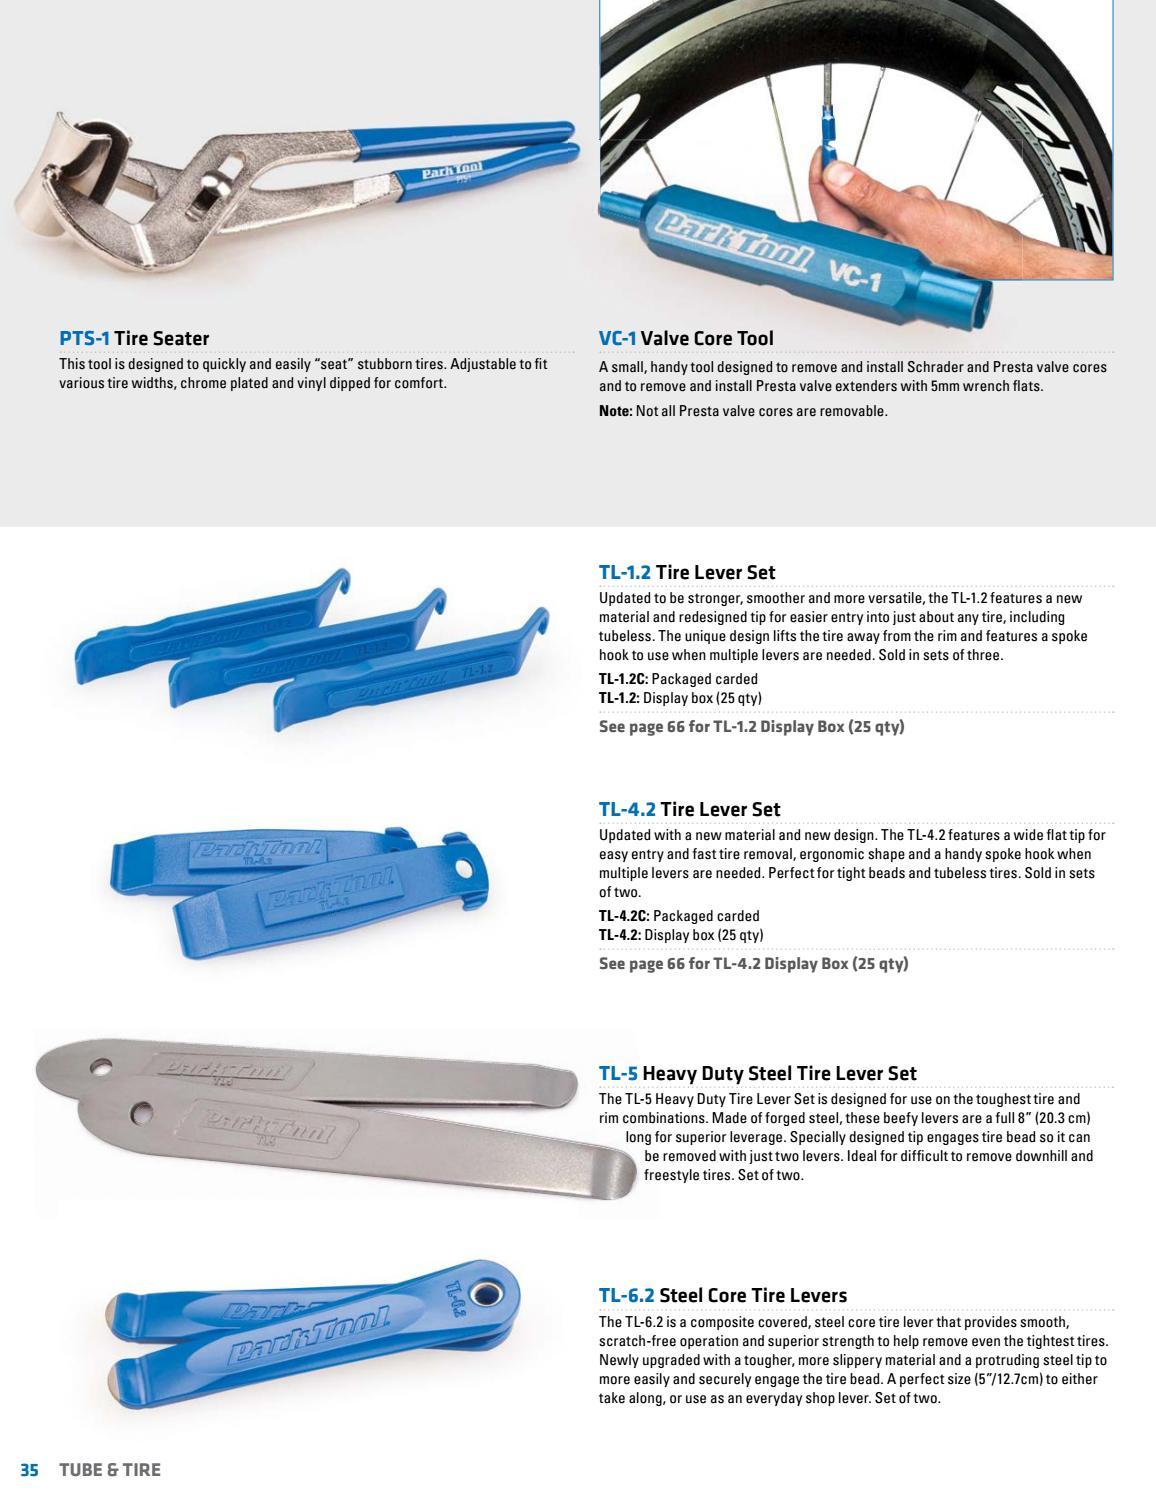 Park Tool TL-6.2 Steel Core Tire Lever Set